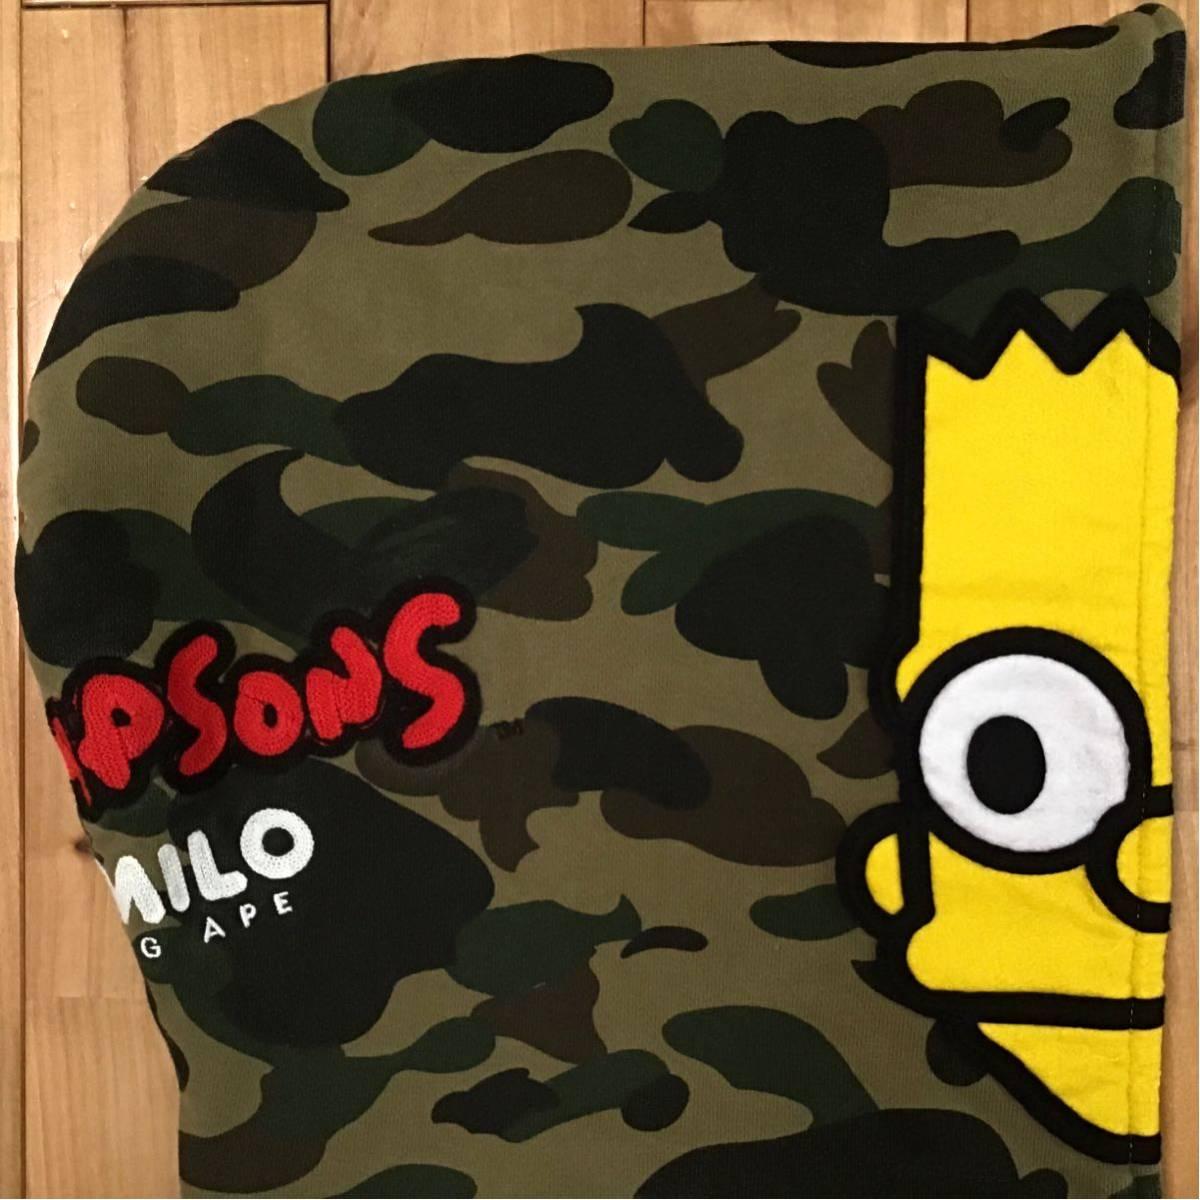 ★XL★ THE SIMPSONS × BAPE BART full zip hoodie a bathing ape baby milo マイロ シンプソンズ パーカー エイプ ベイプ 1st camo mf3